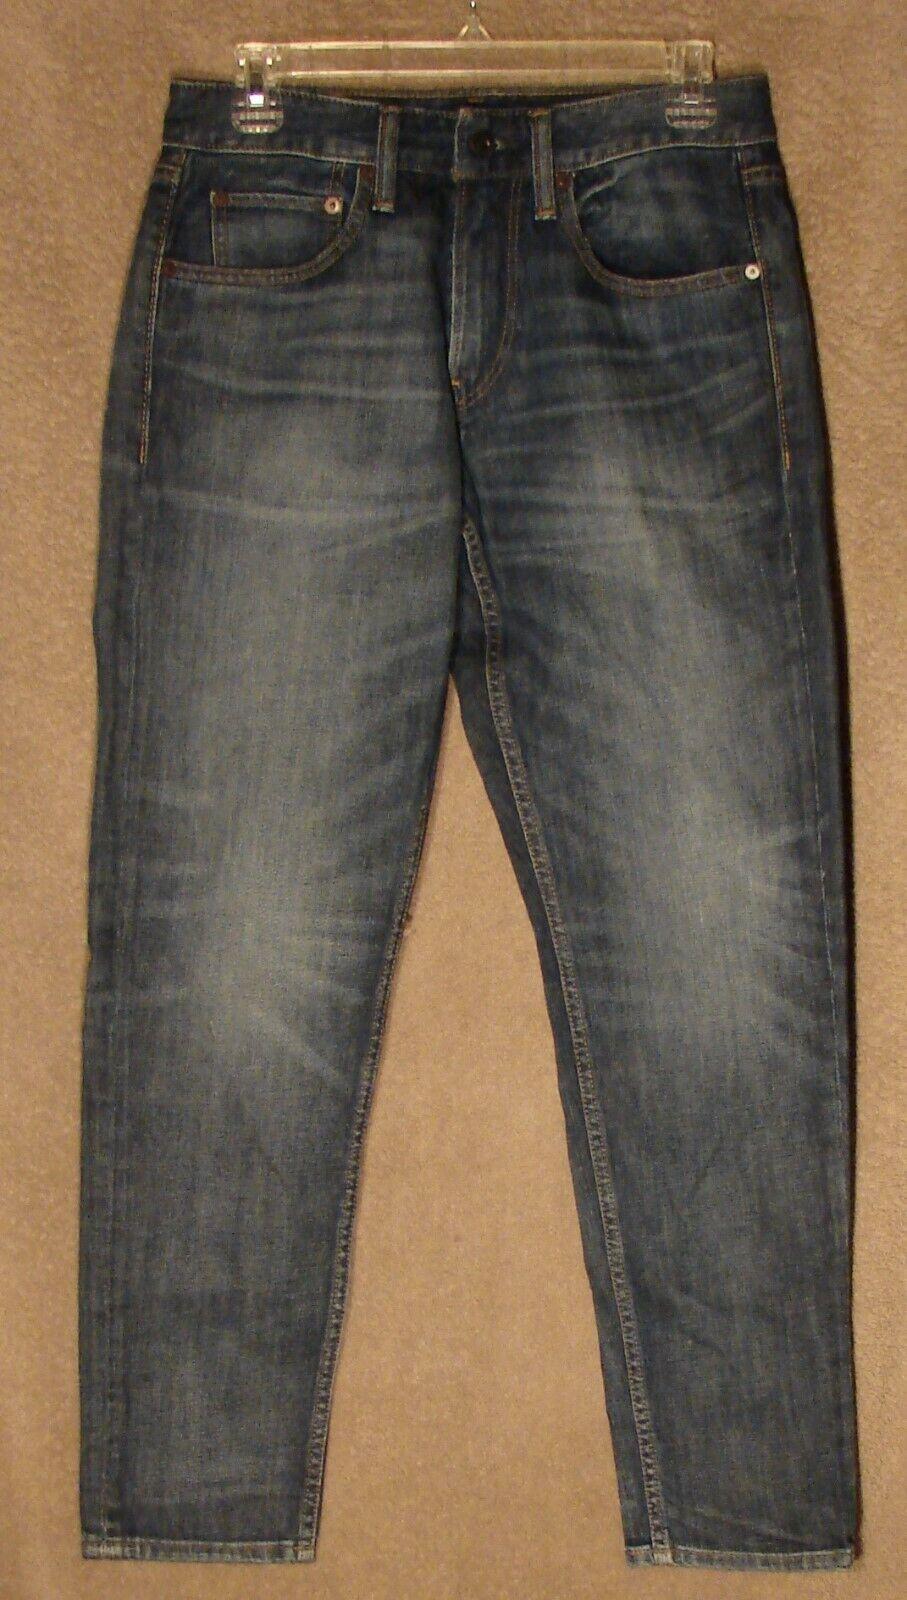 NWOT Athletic Fit Medium Wash Blaine bluee Jeans by Bonobos, Size 28 X 30